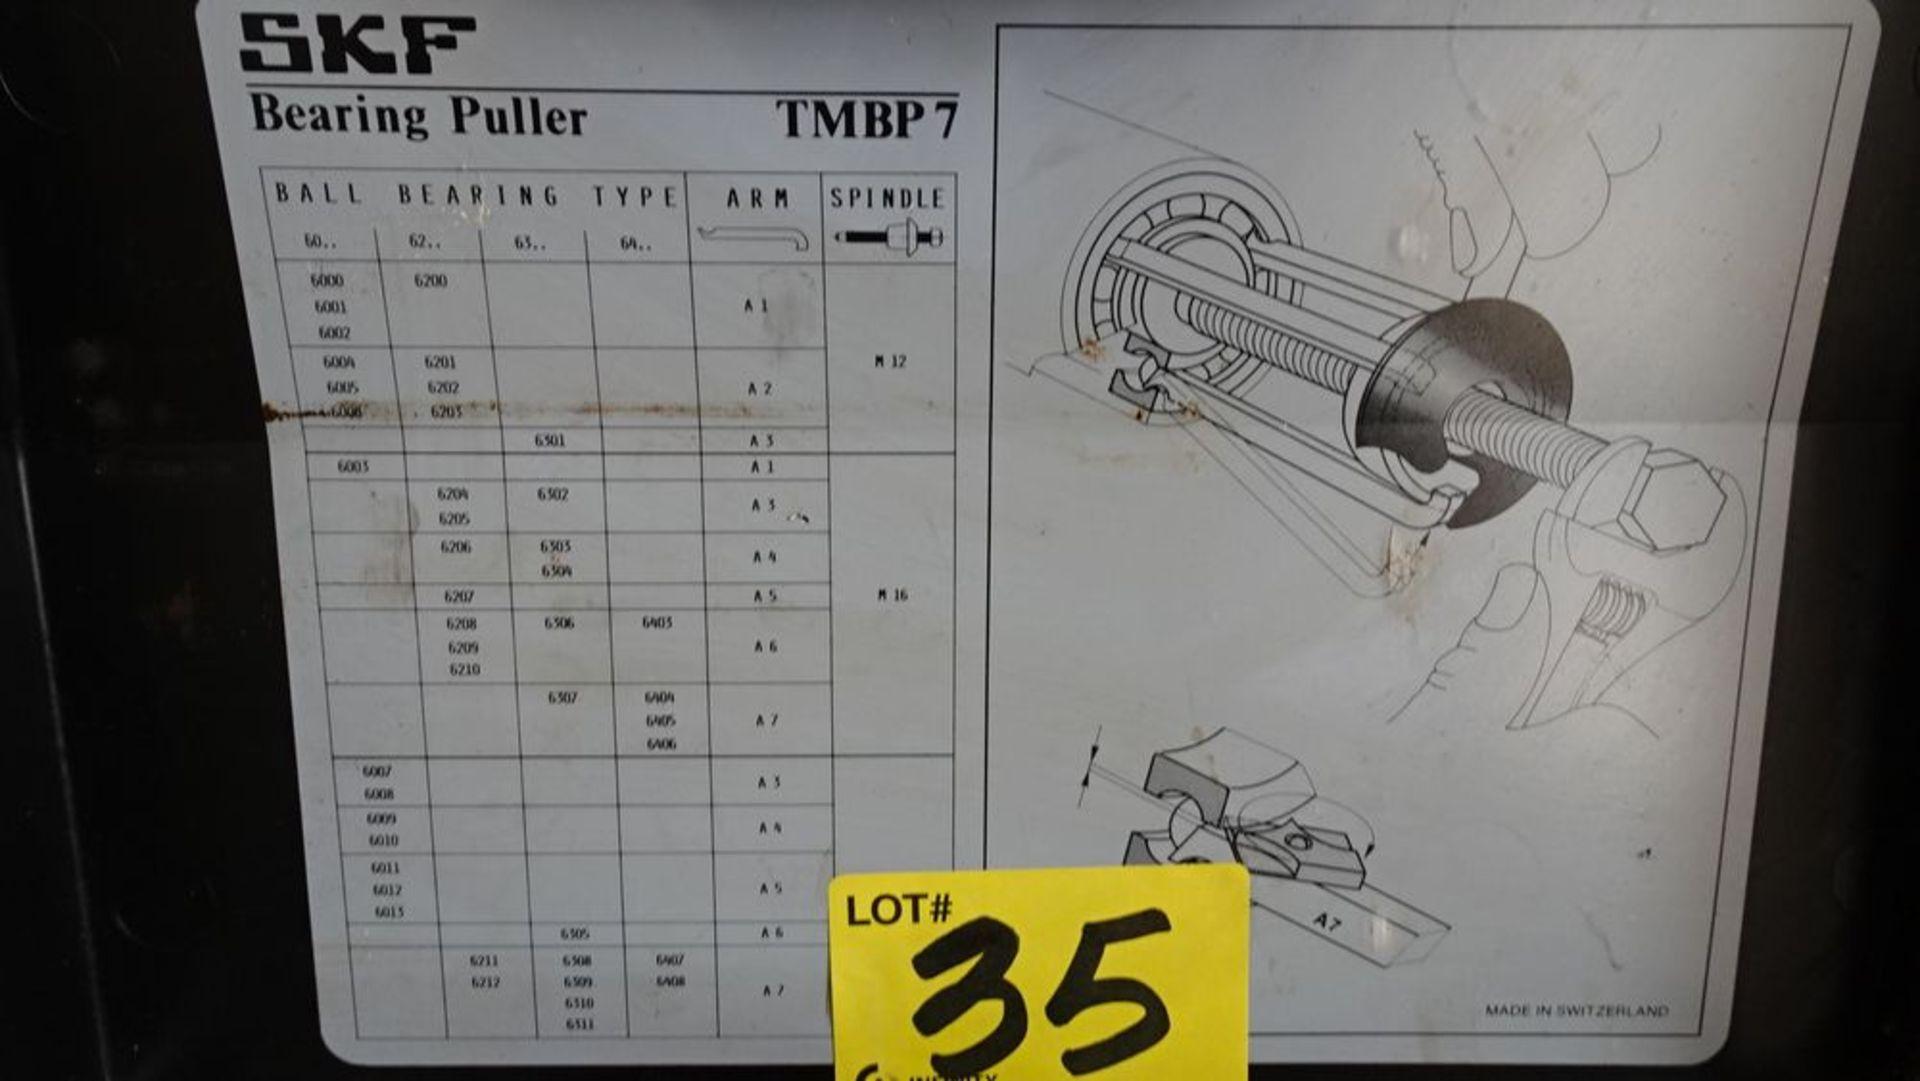 Lot 35 - SKF TMBP7 BEARING PULLER C/W CASE